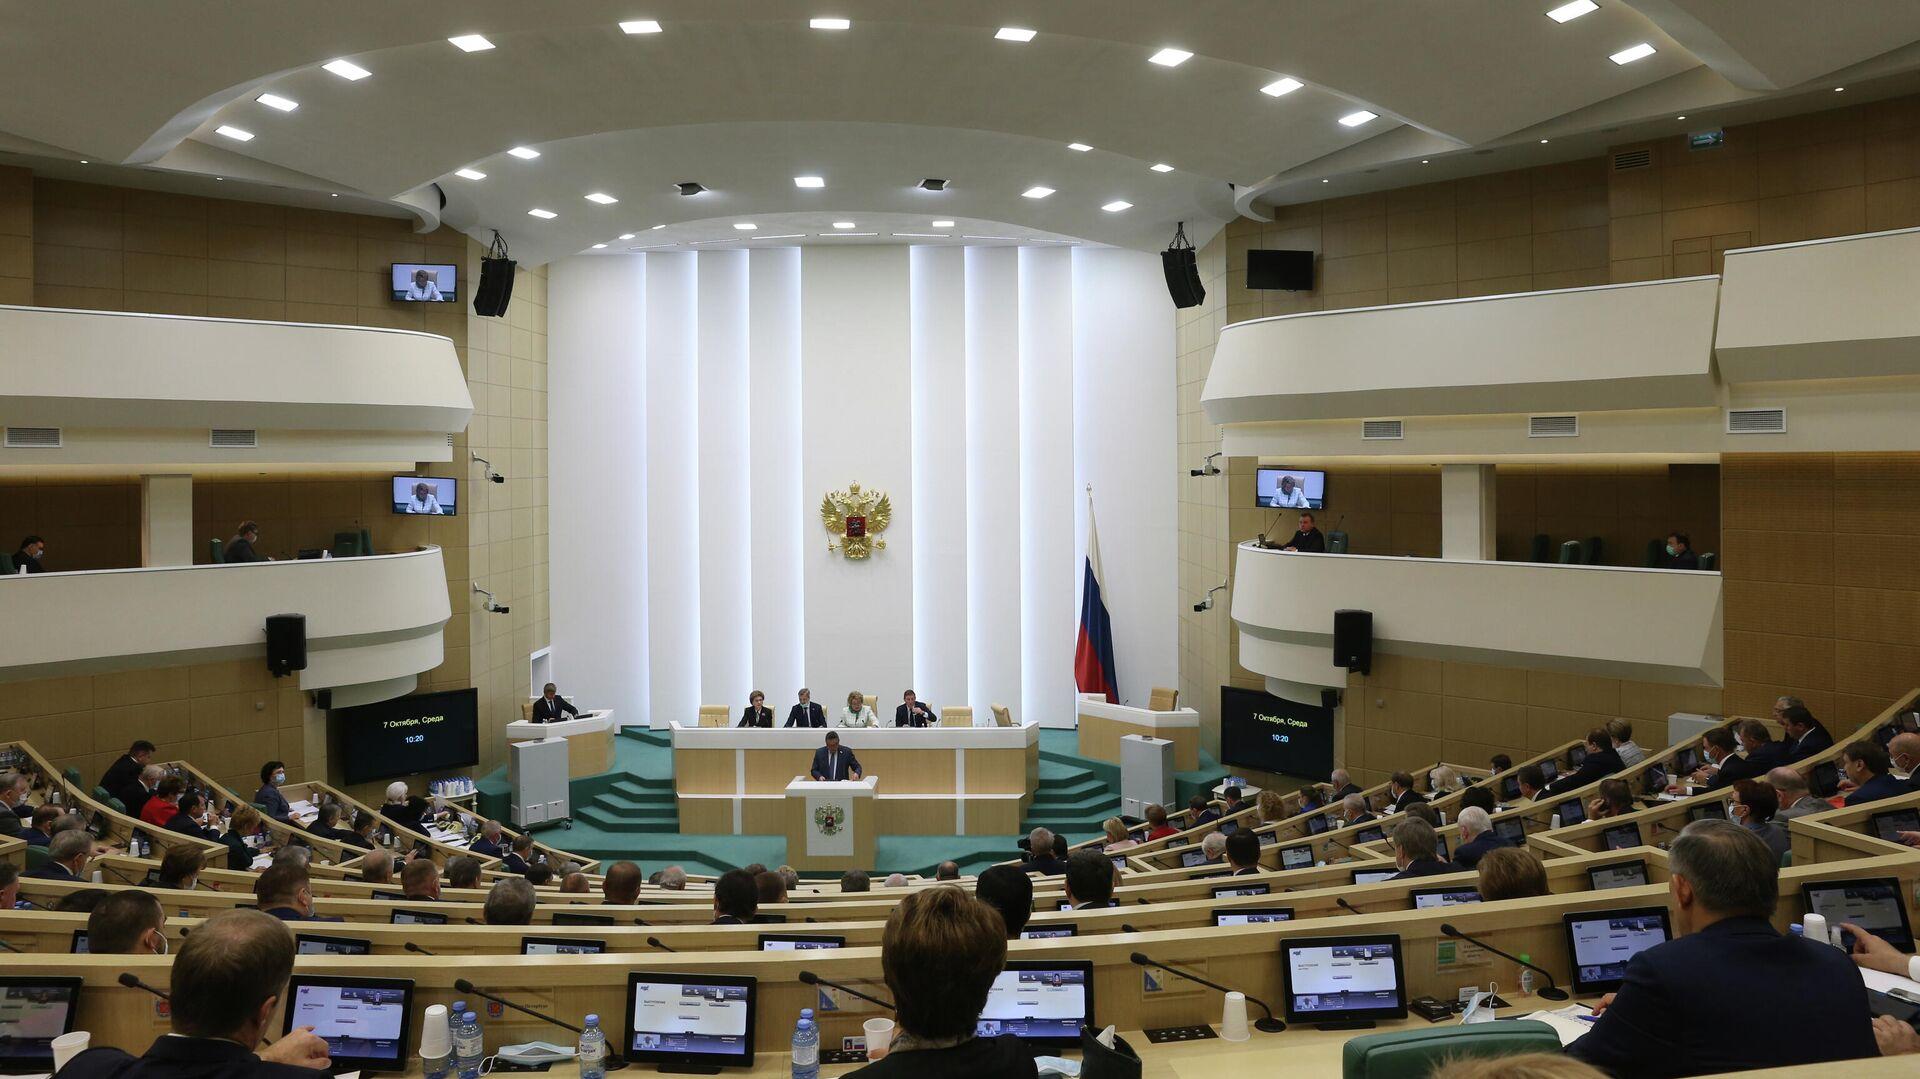 Зал заседаний Совета Федерации - РИА Новости, 1920, 21.10.2020